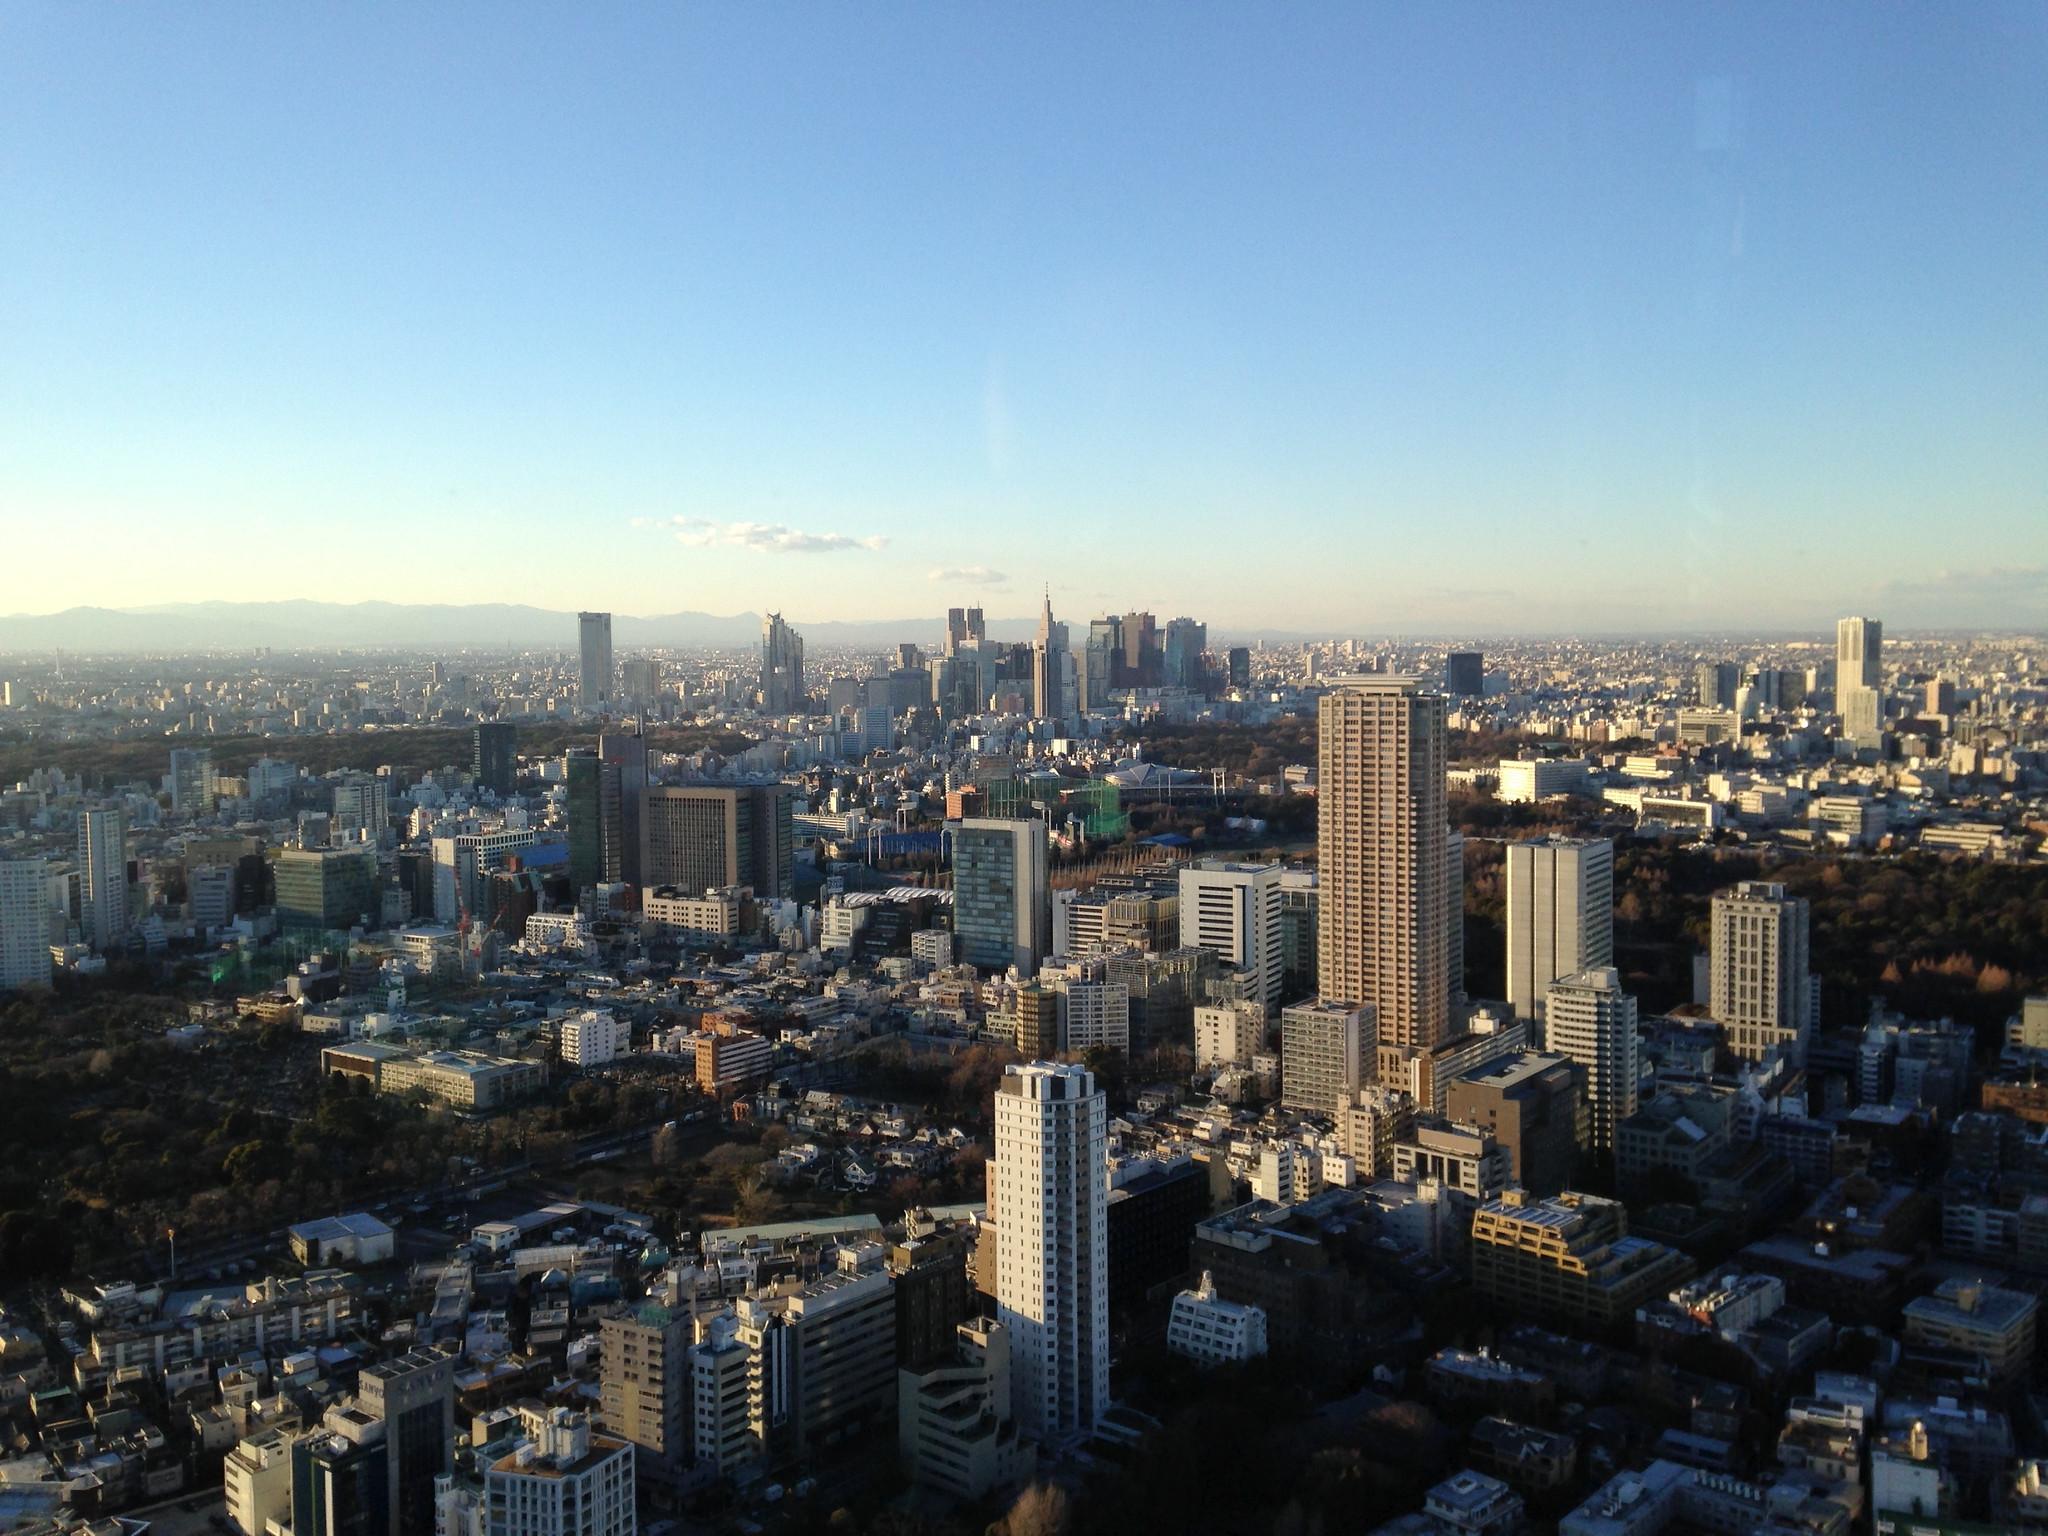 Tokyo from the Ritz Carlton